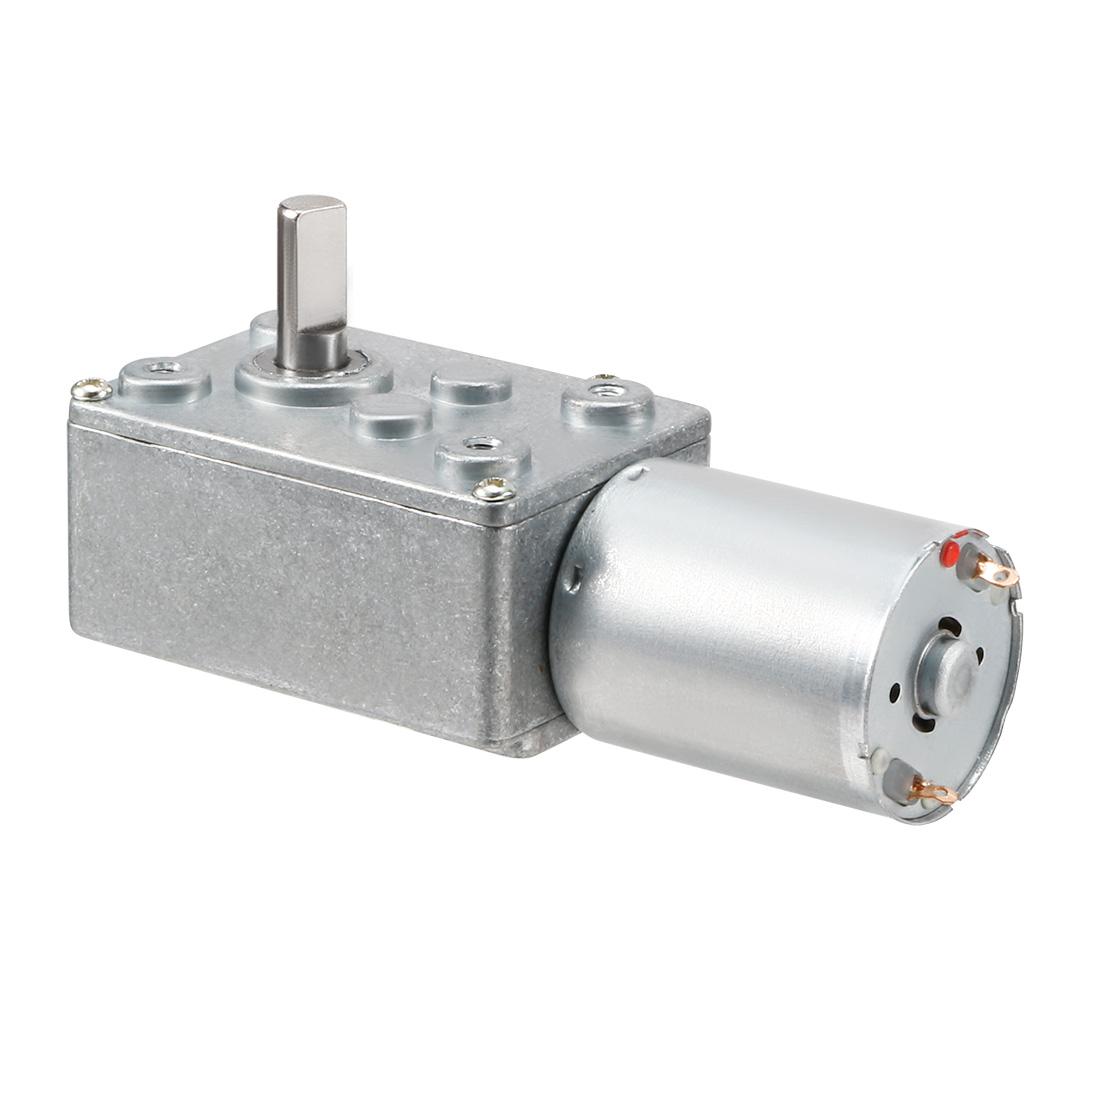 6mm Shaft 100RPM Reduction Ratio 65/1 Speed Reducer Worm Gear Motor DC 12V JSX69-370